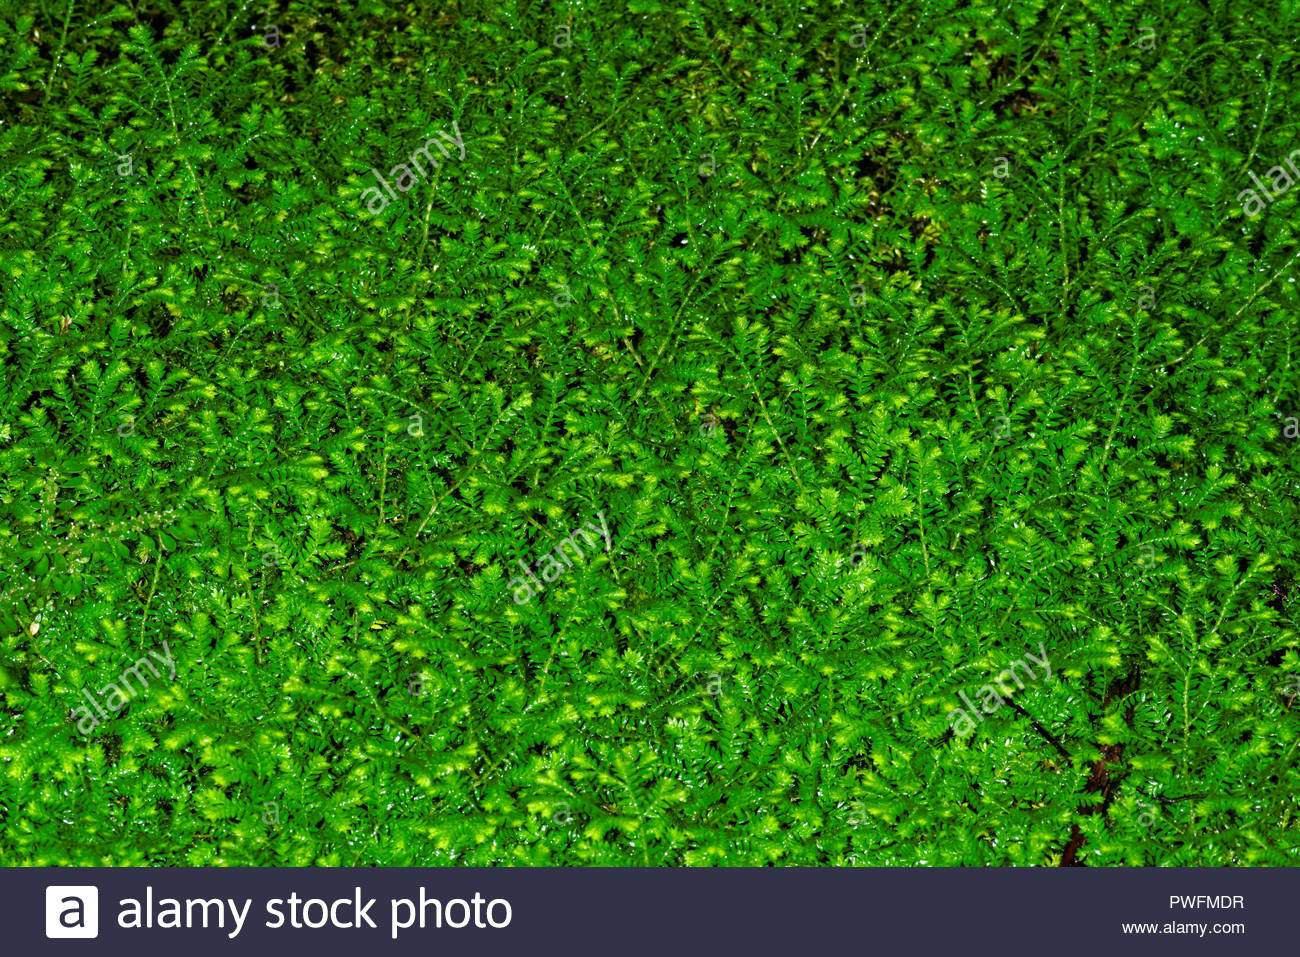 selaginella kraussiana manchmal auch durch den gemeinsamen namen krauss spikemoss pwfmdr